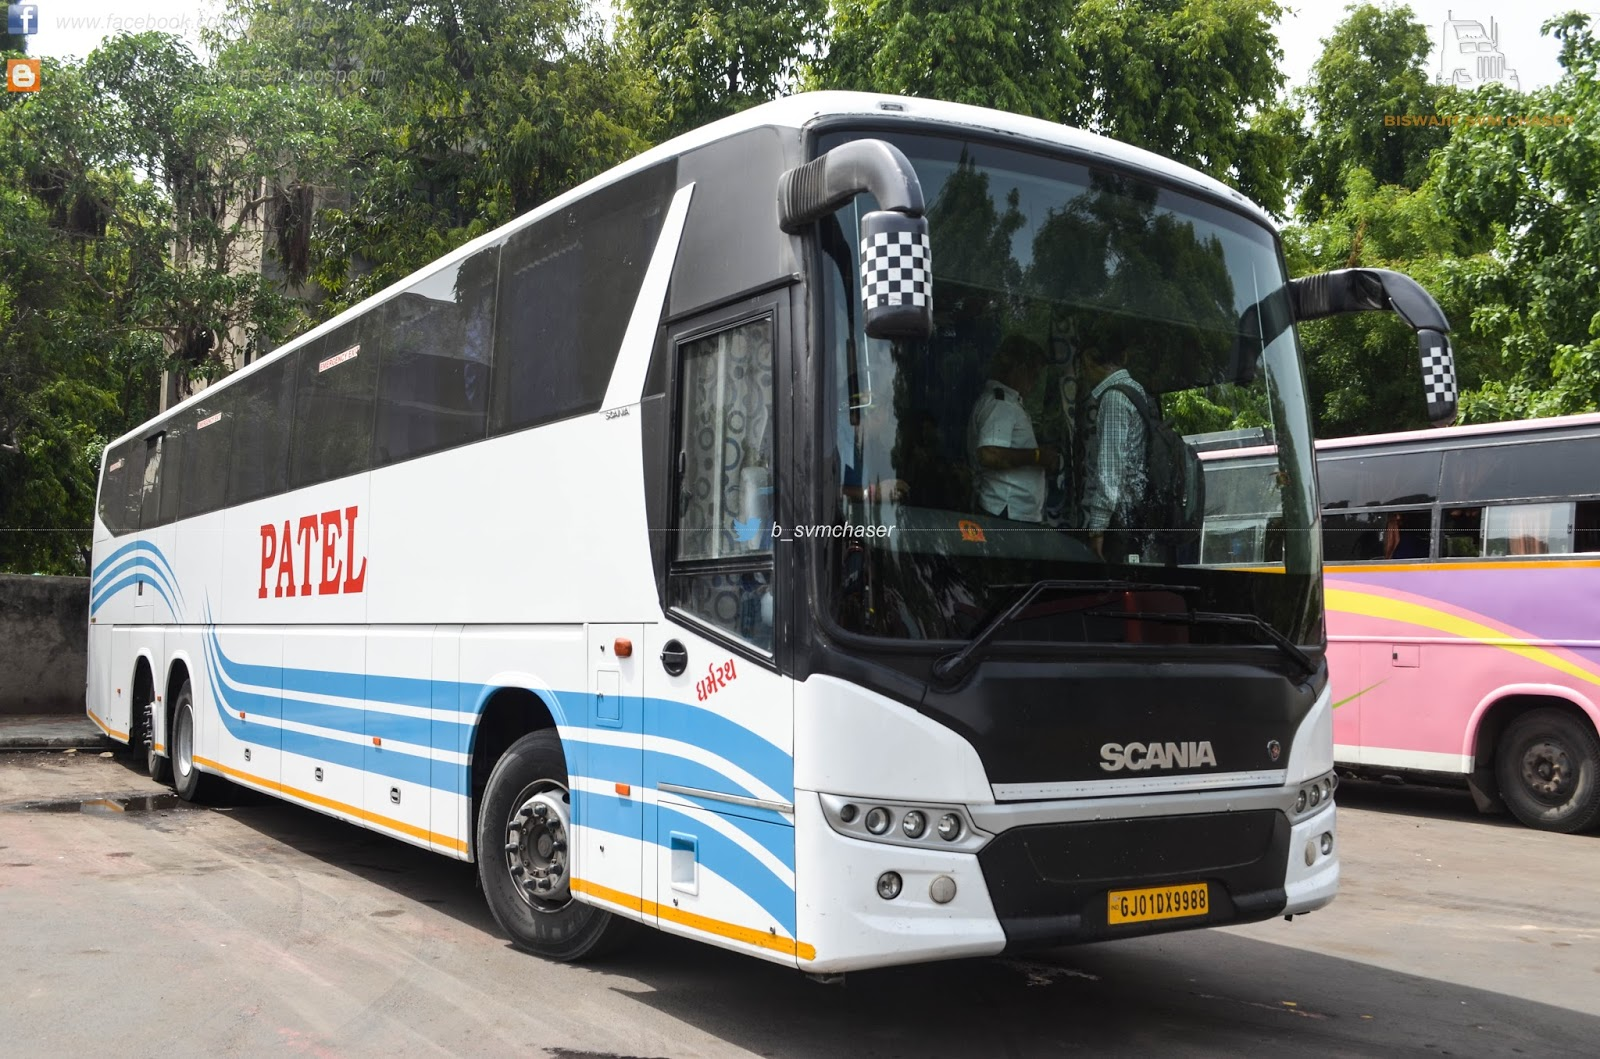 Patel Scania Metrolink Hd Multiaxle Seater Gj01 Dx 9988